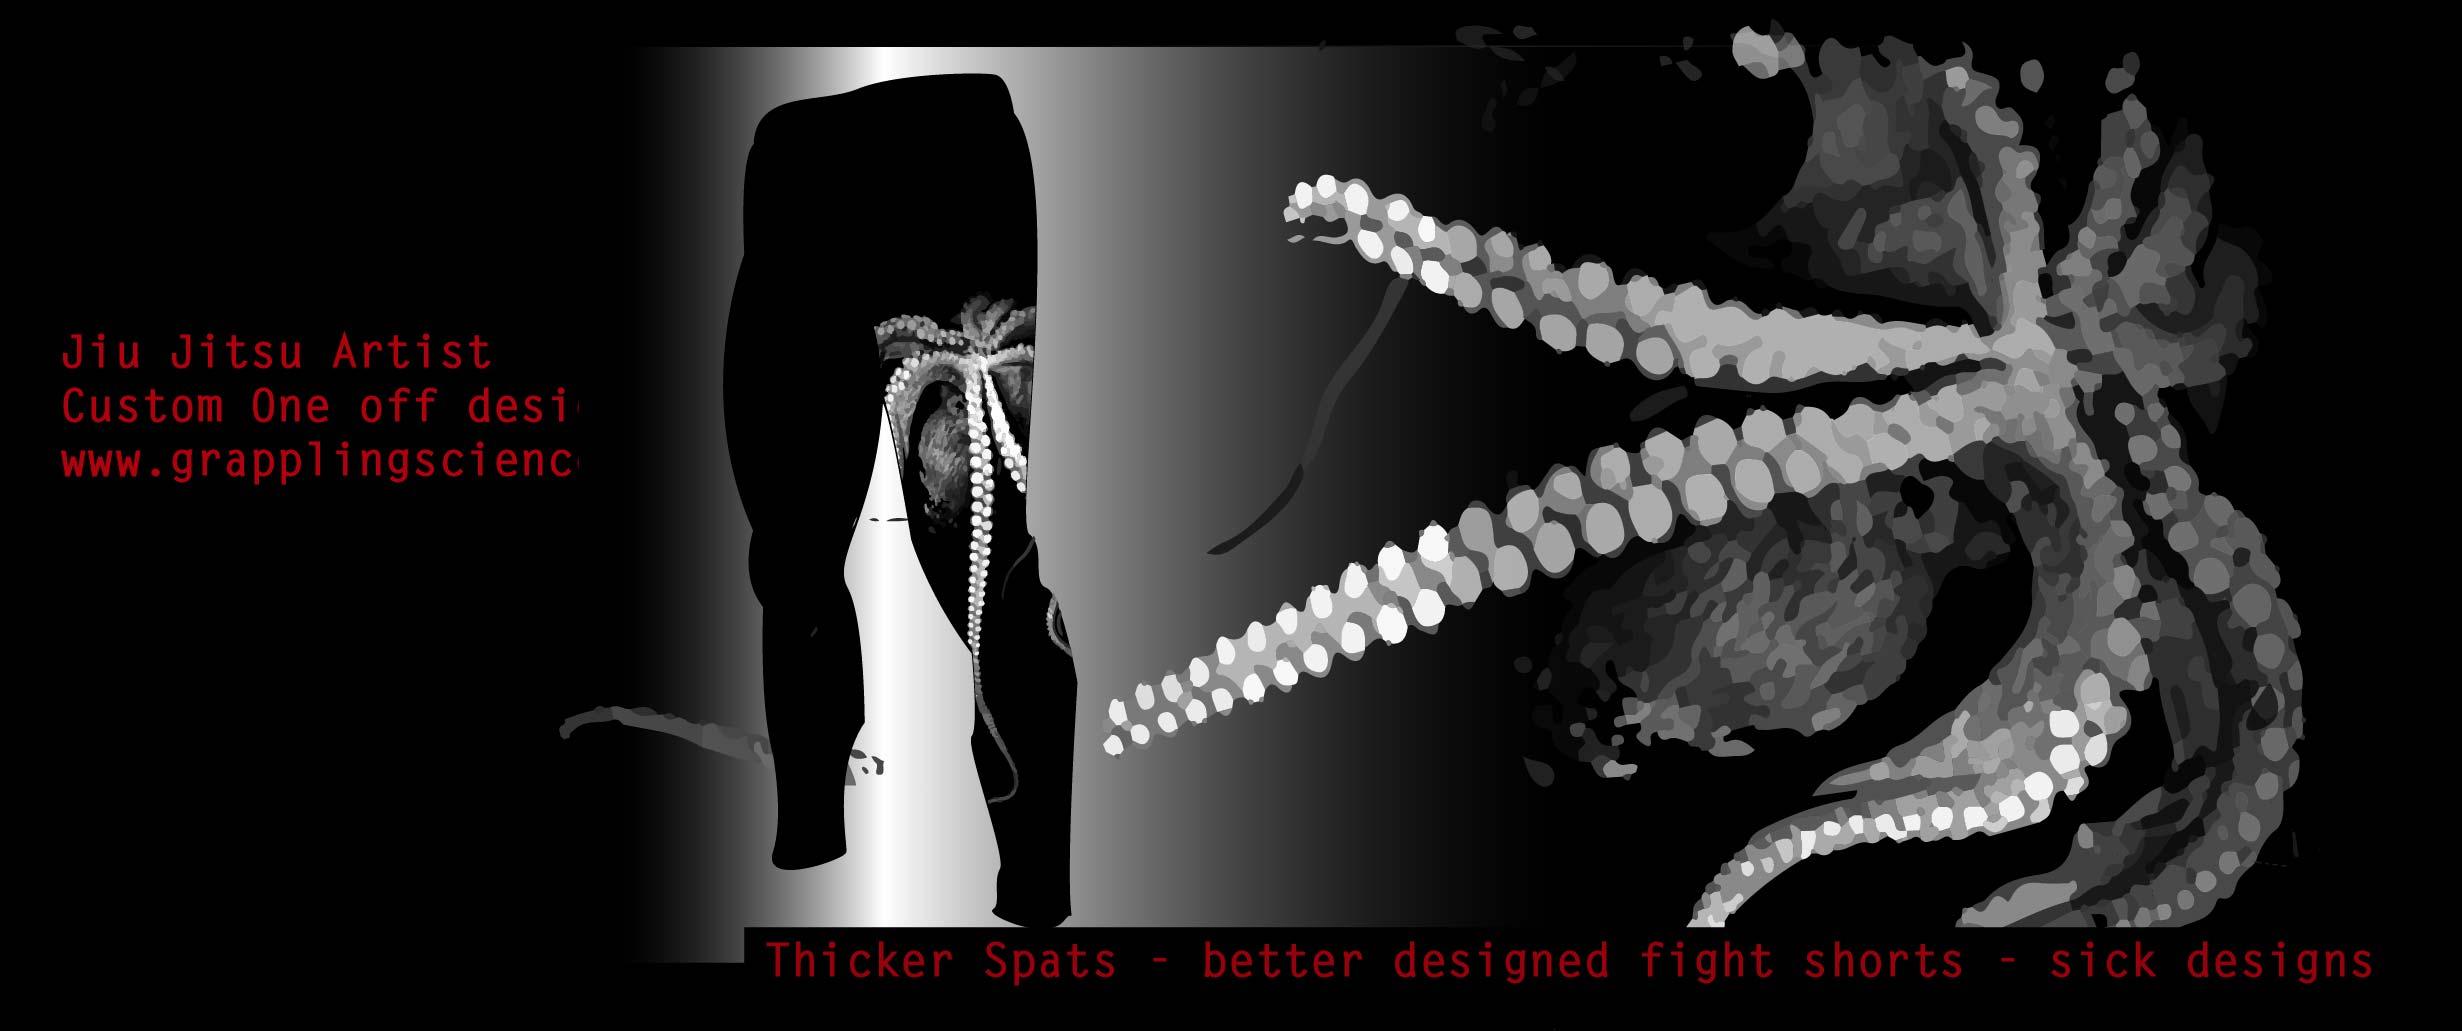 fb slideshow ready bw spats.jpg